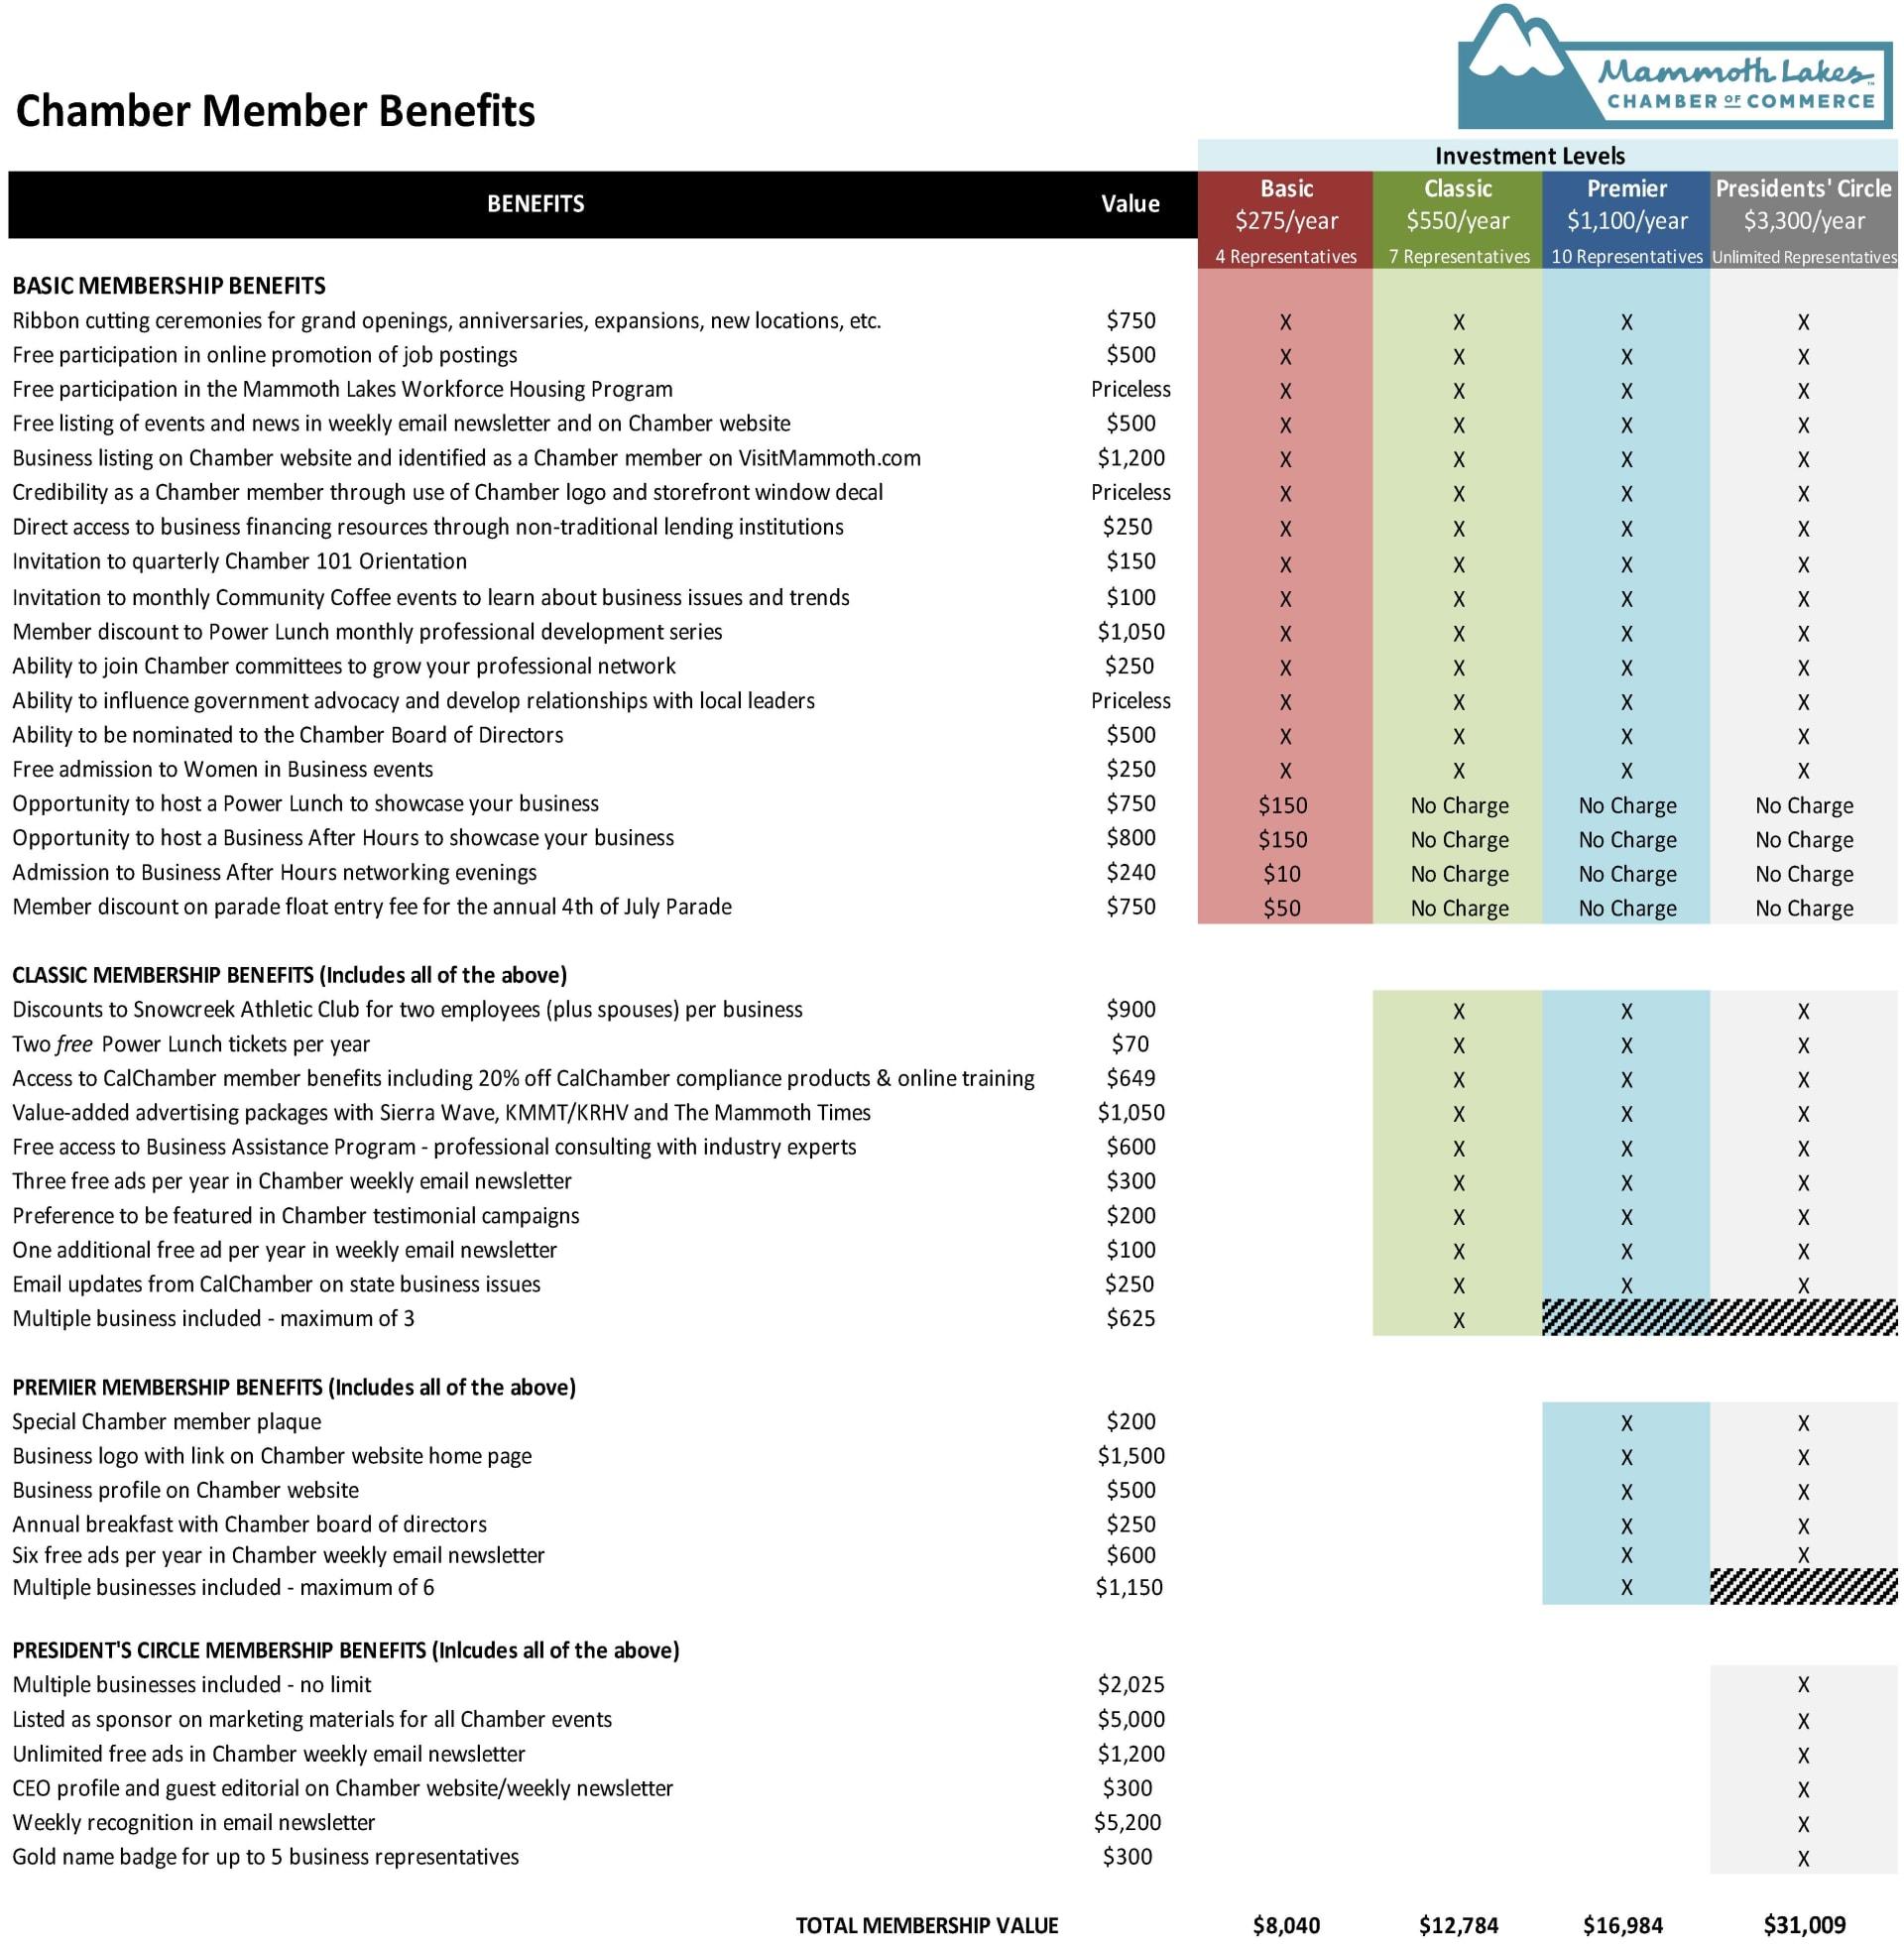 2020-Chamber-Member-Benefits-w1920.jpg